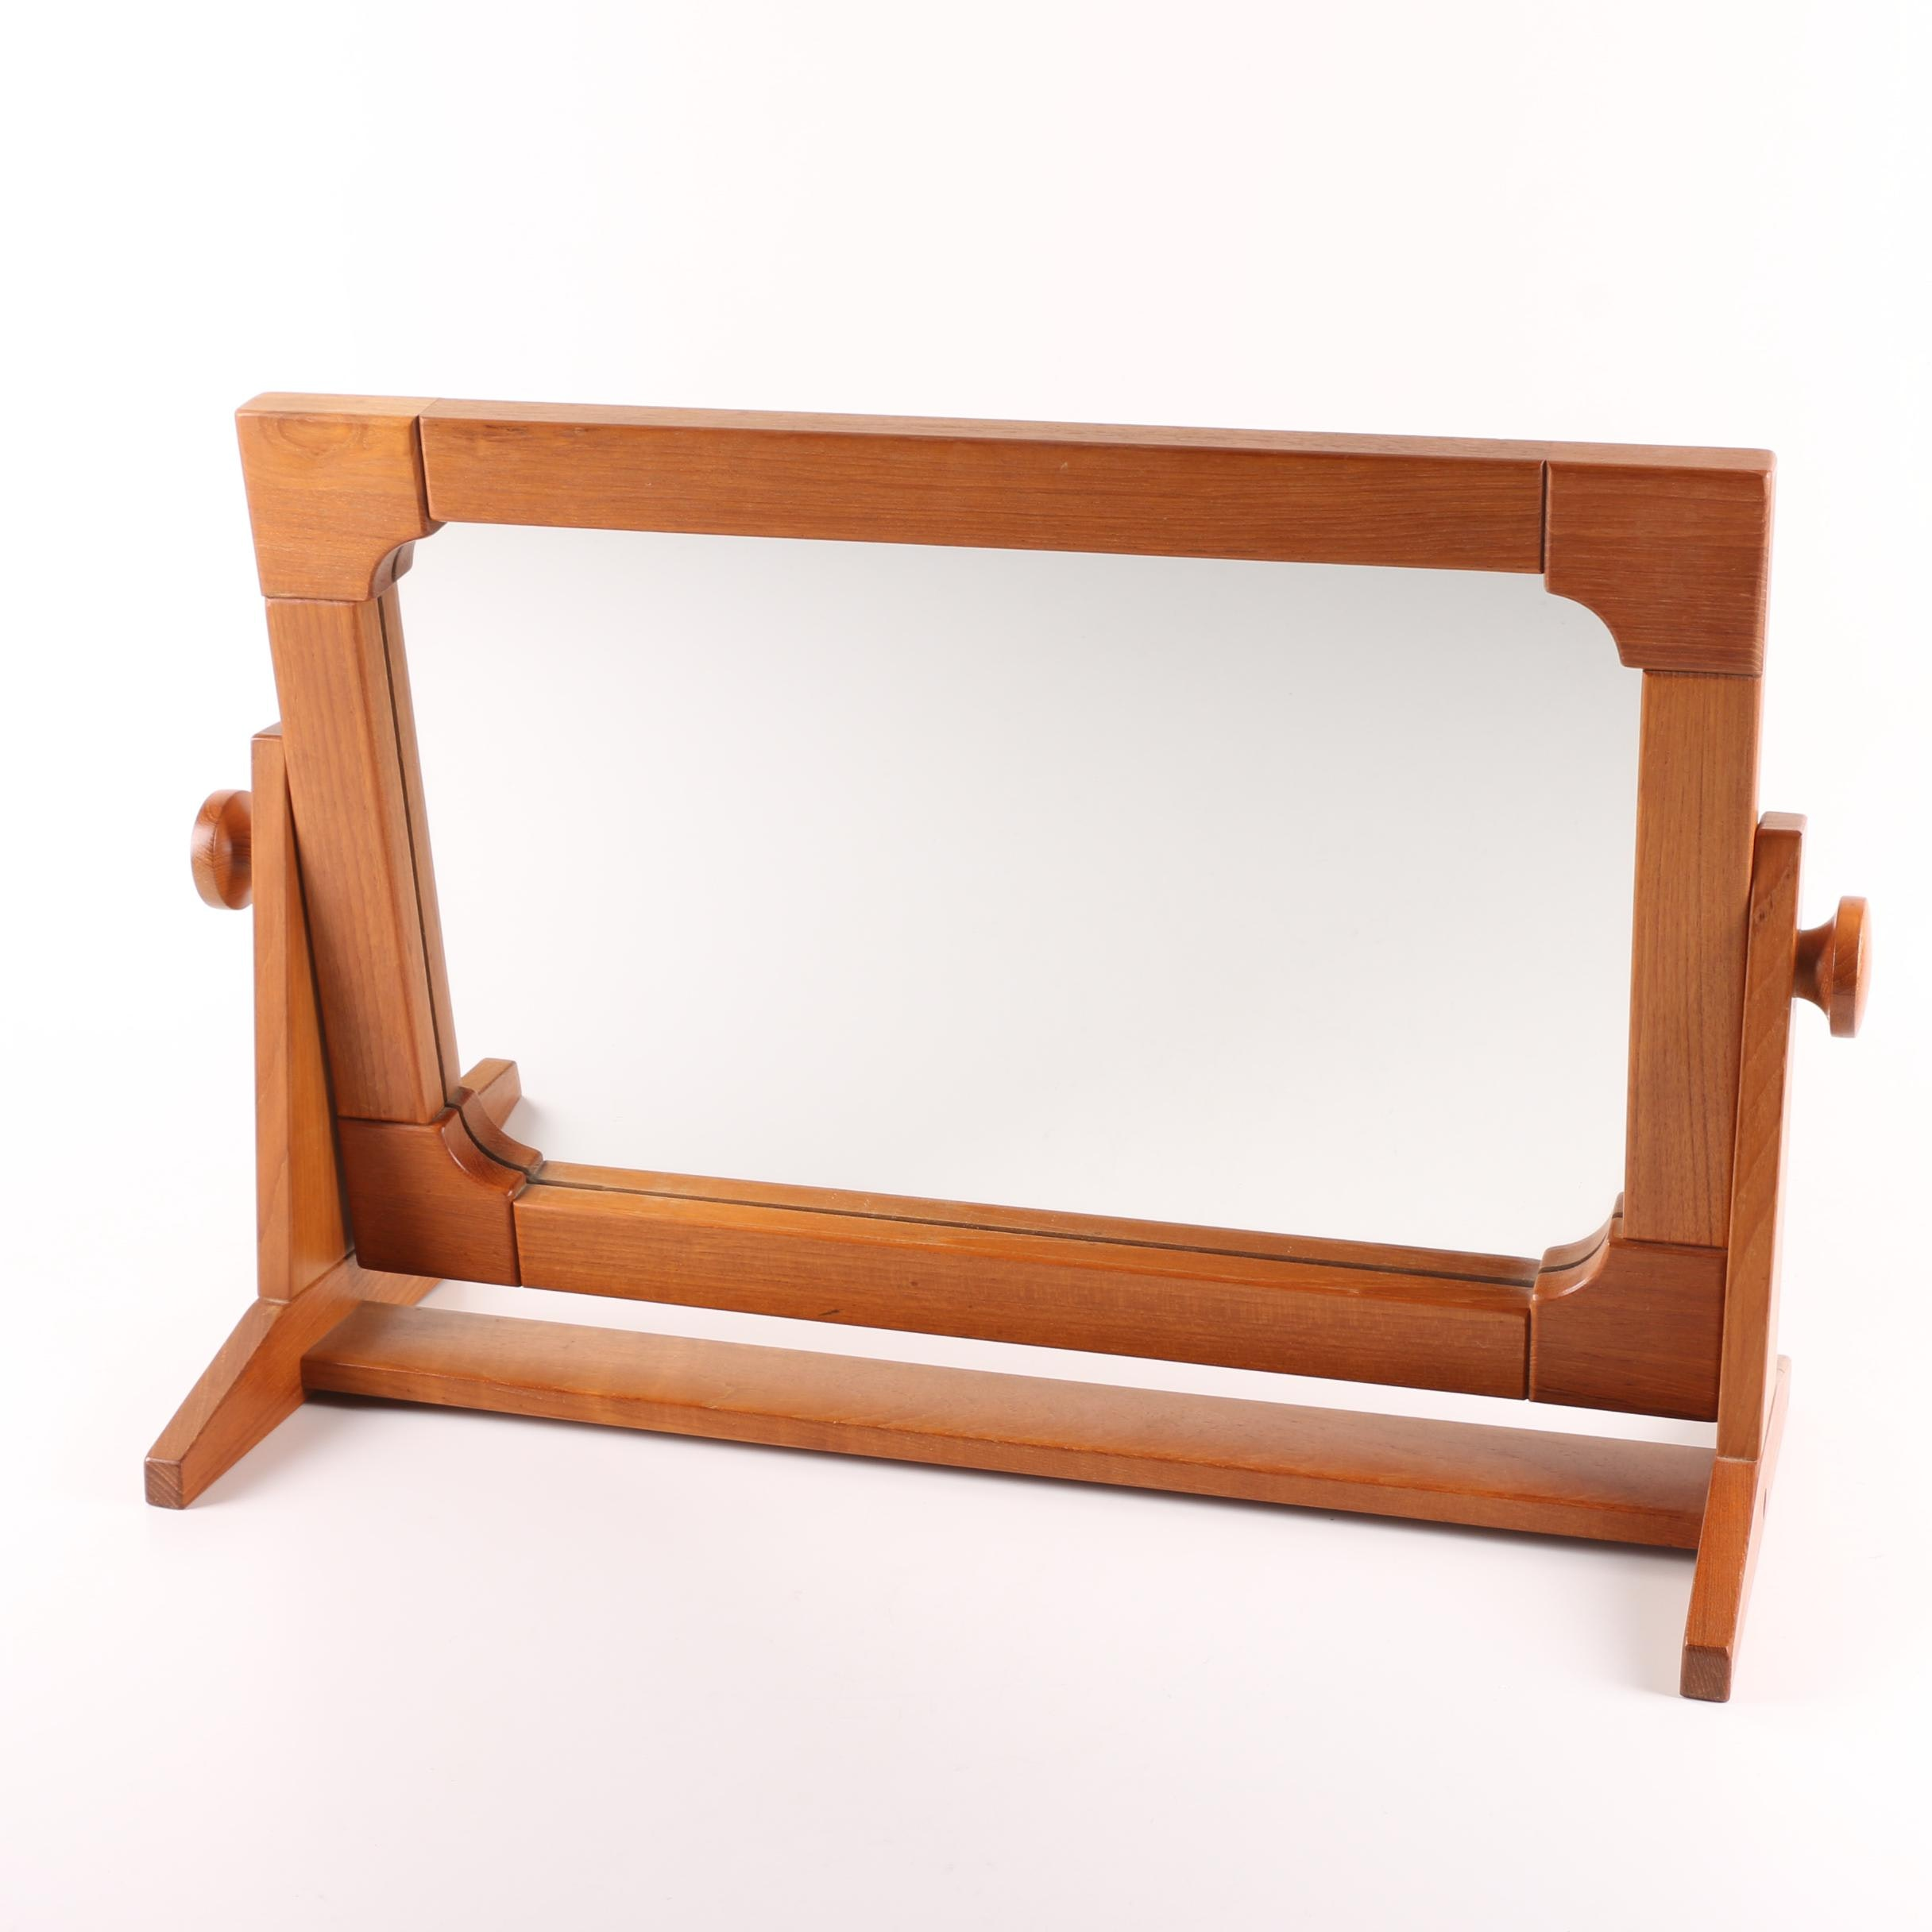 Pedersen & Hansen Danish Mid Century Modern Teak Vanity Mirror